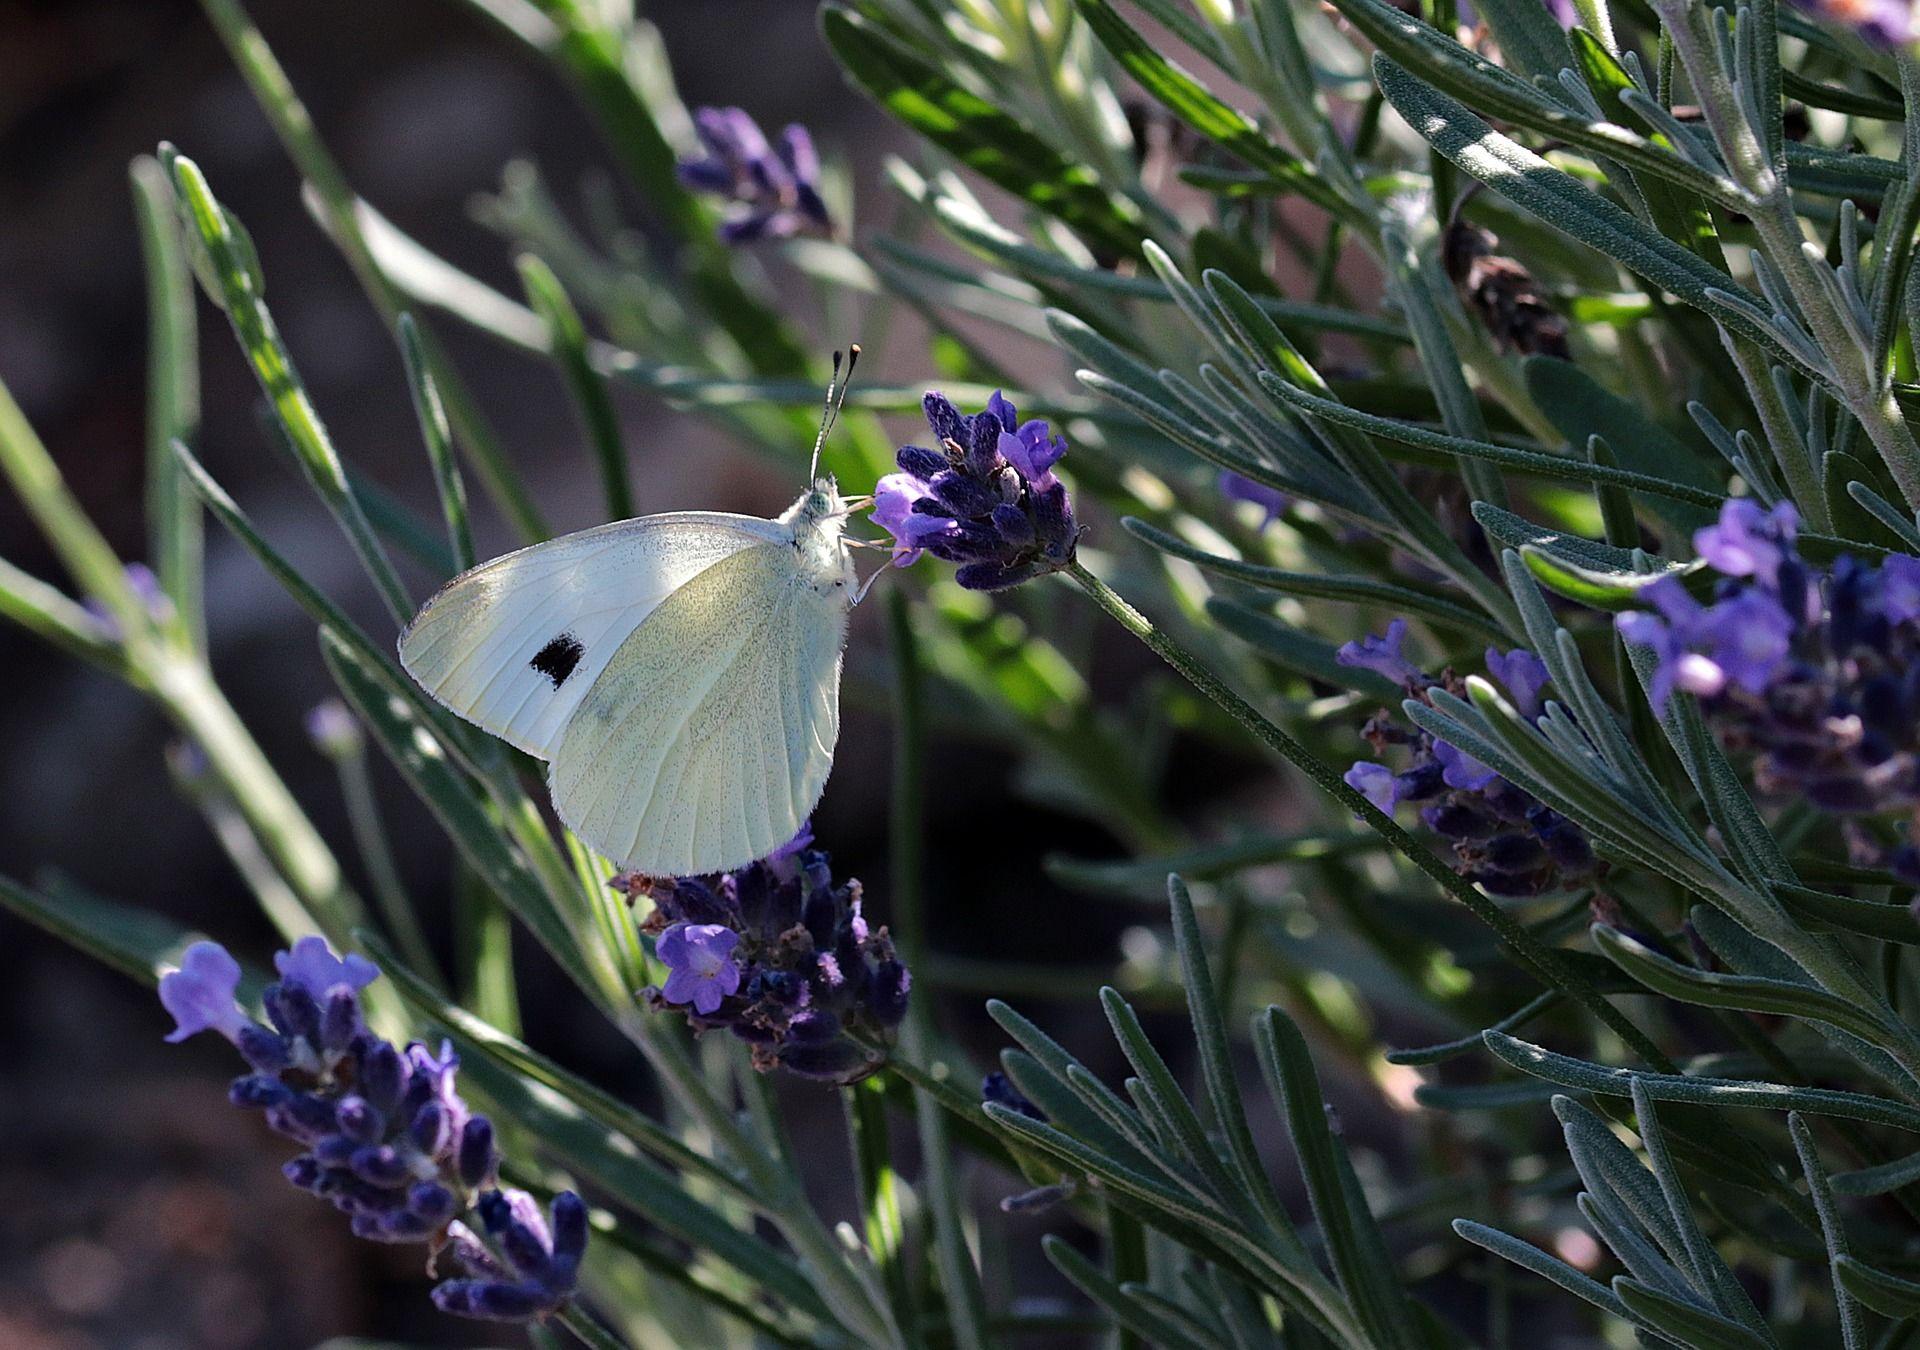 Картинка большой белой бабочки